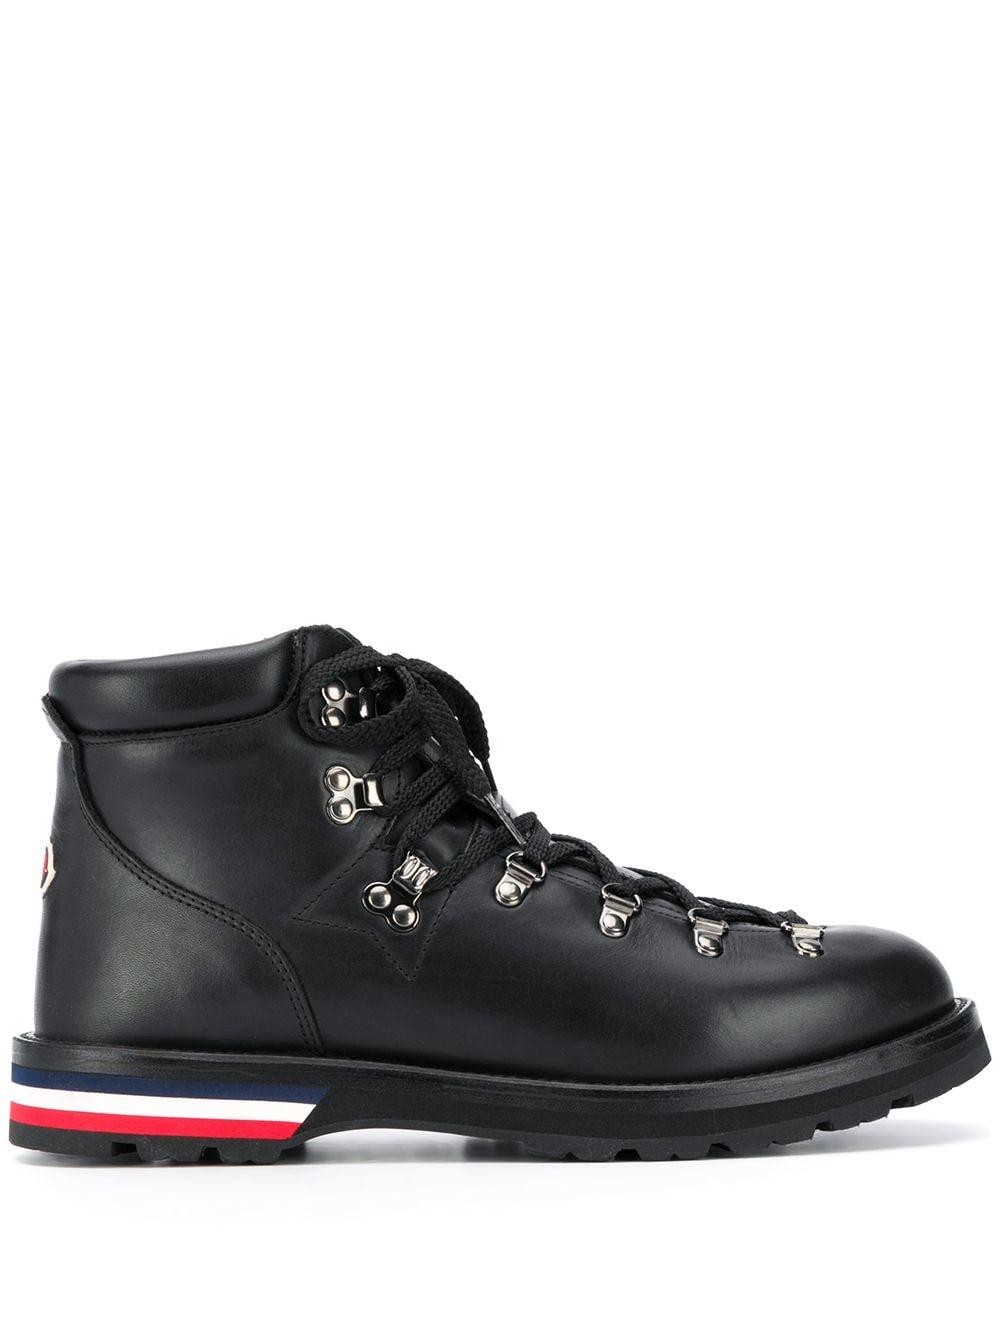 Peak Boots